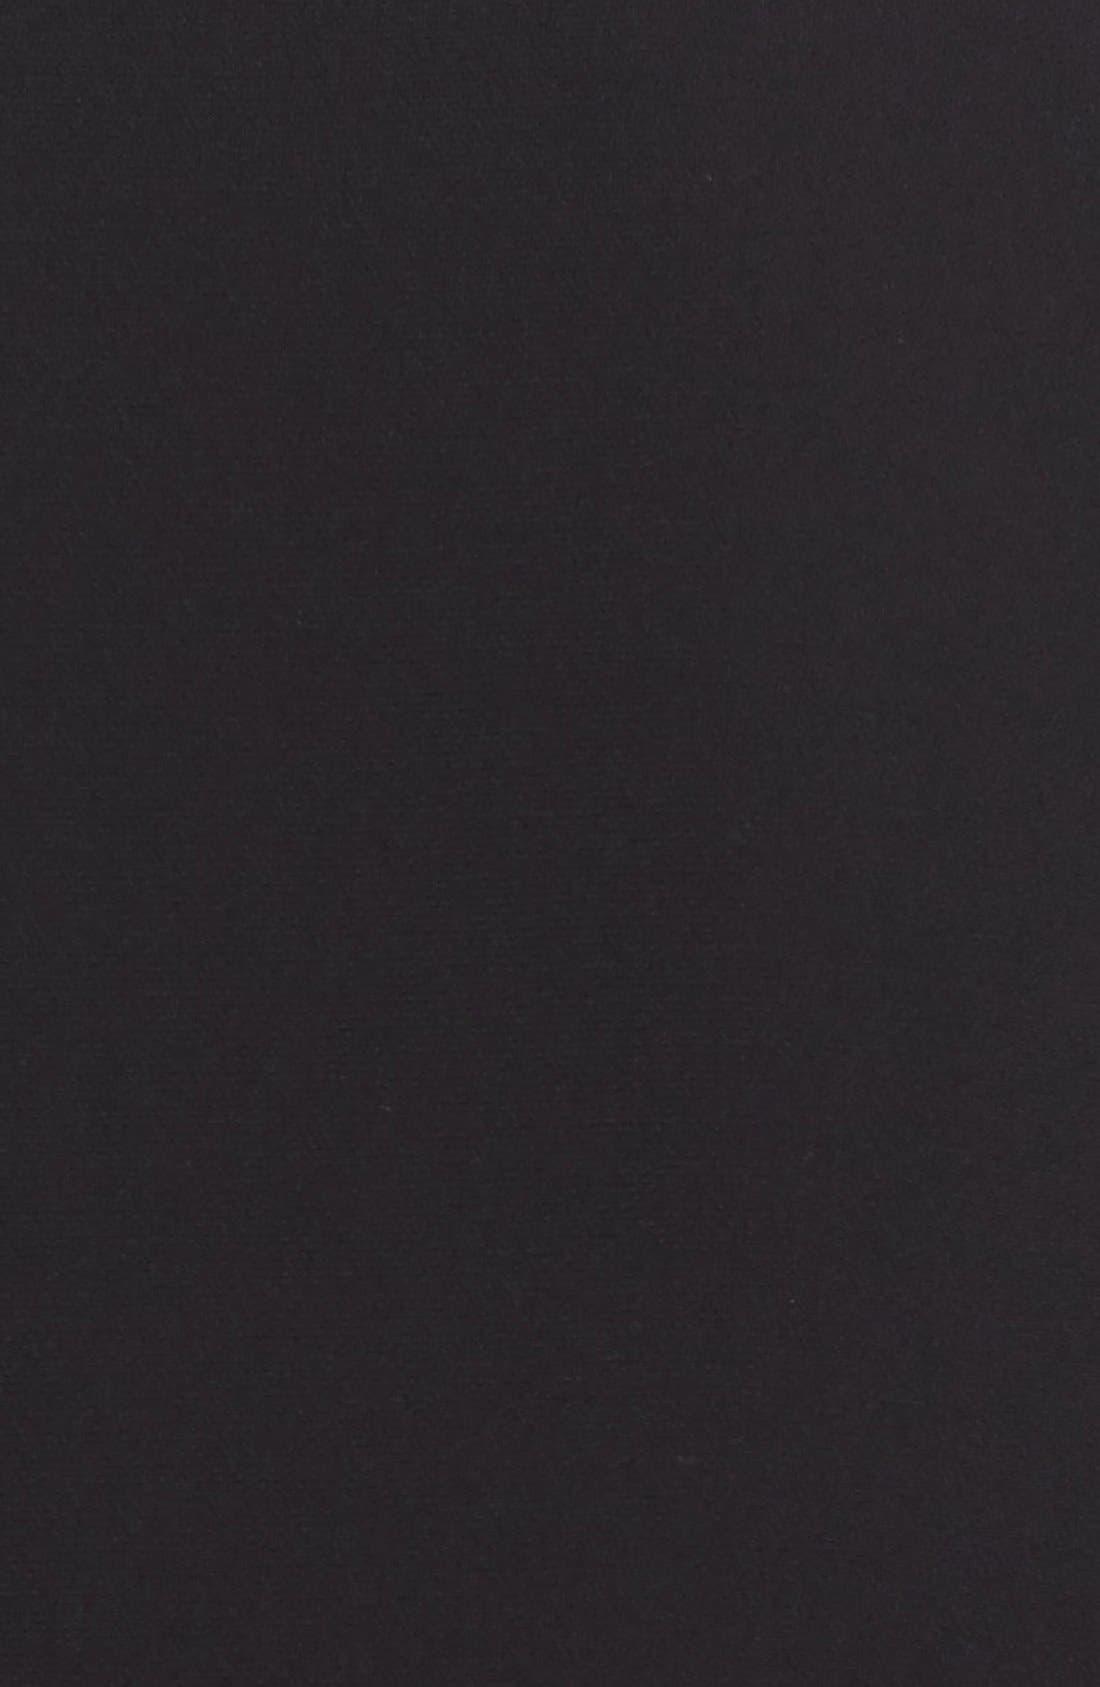 Acacia Lace Detail Jacket,                             Alternate thumbnail 3, color,                             Black